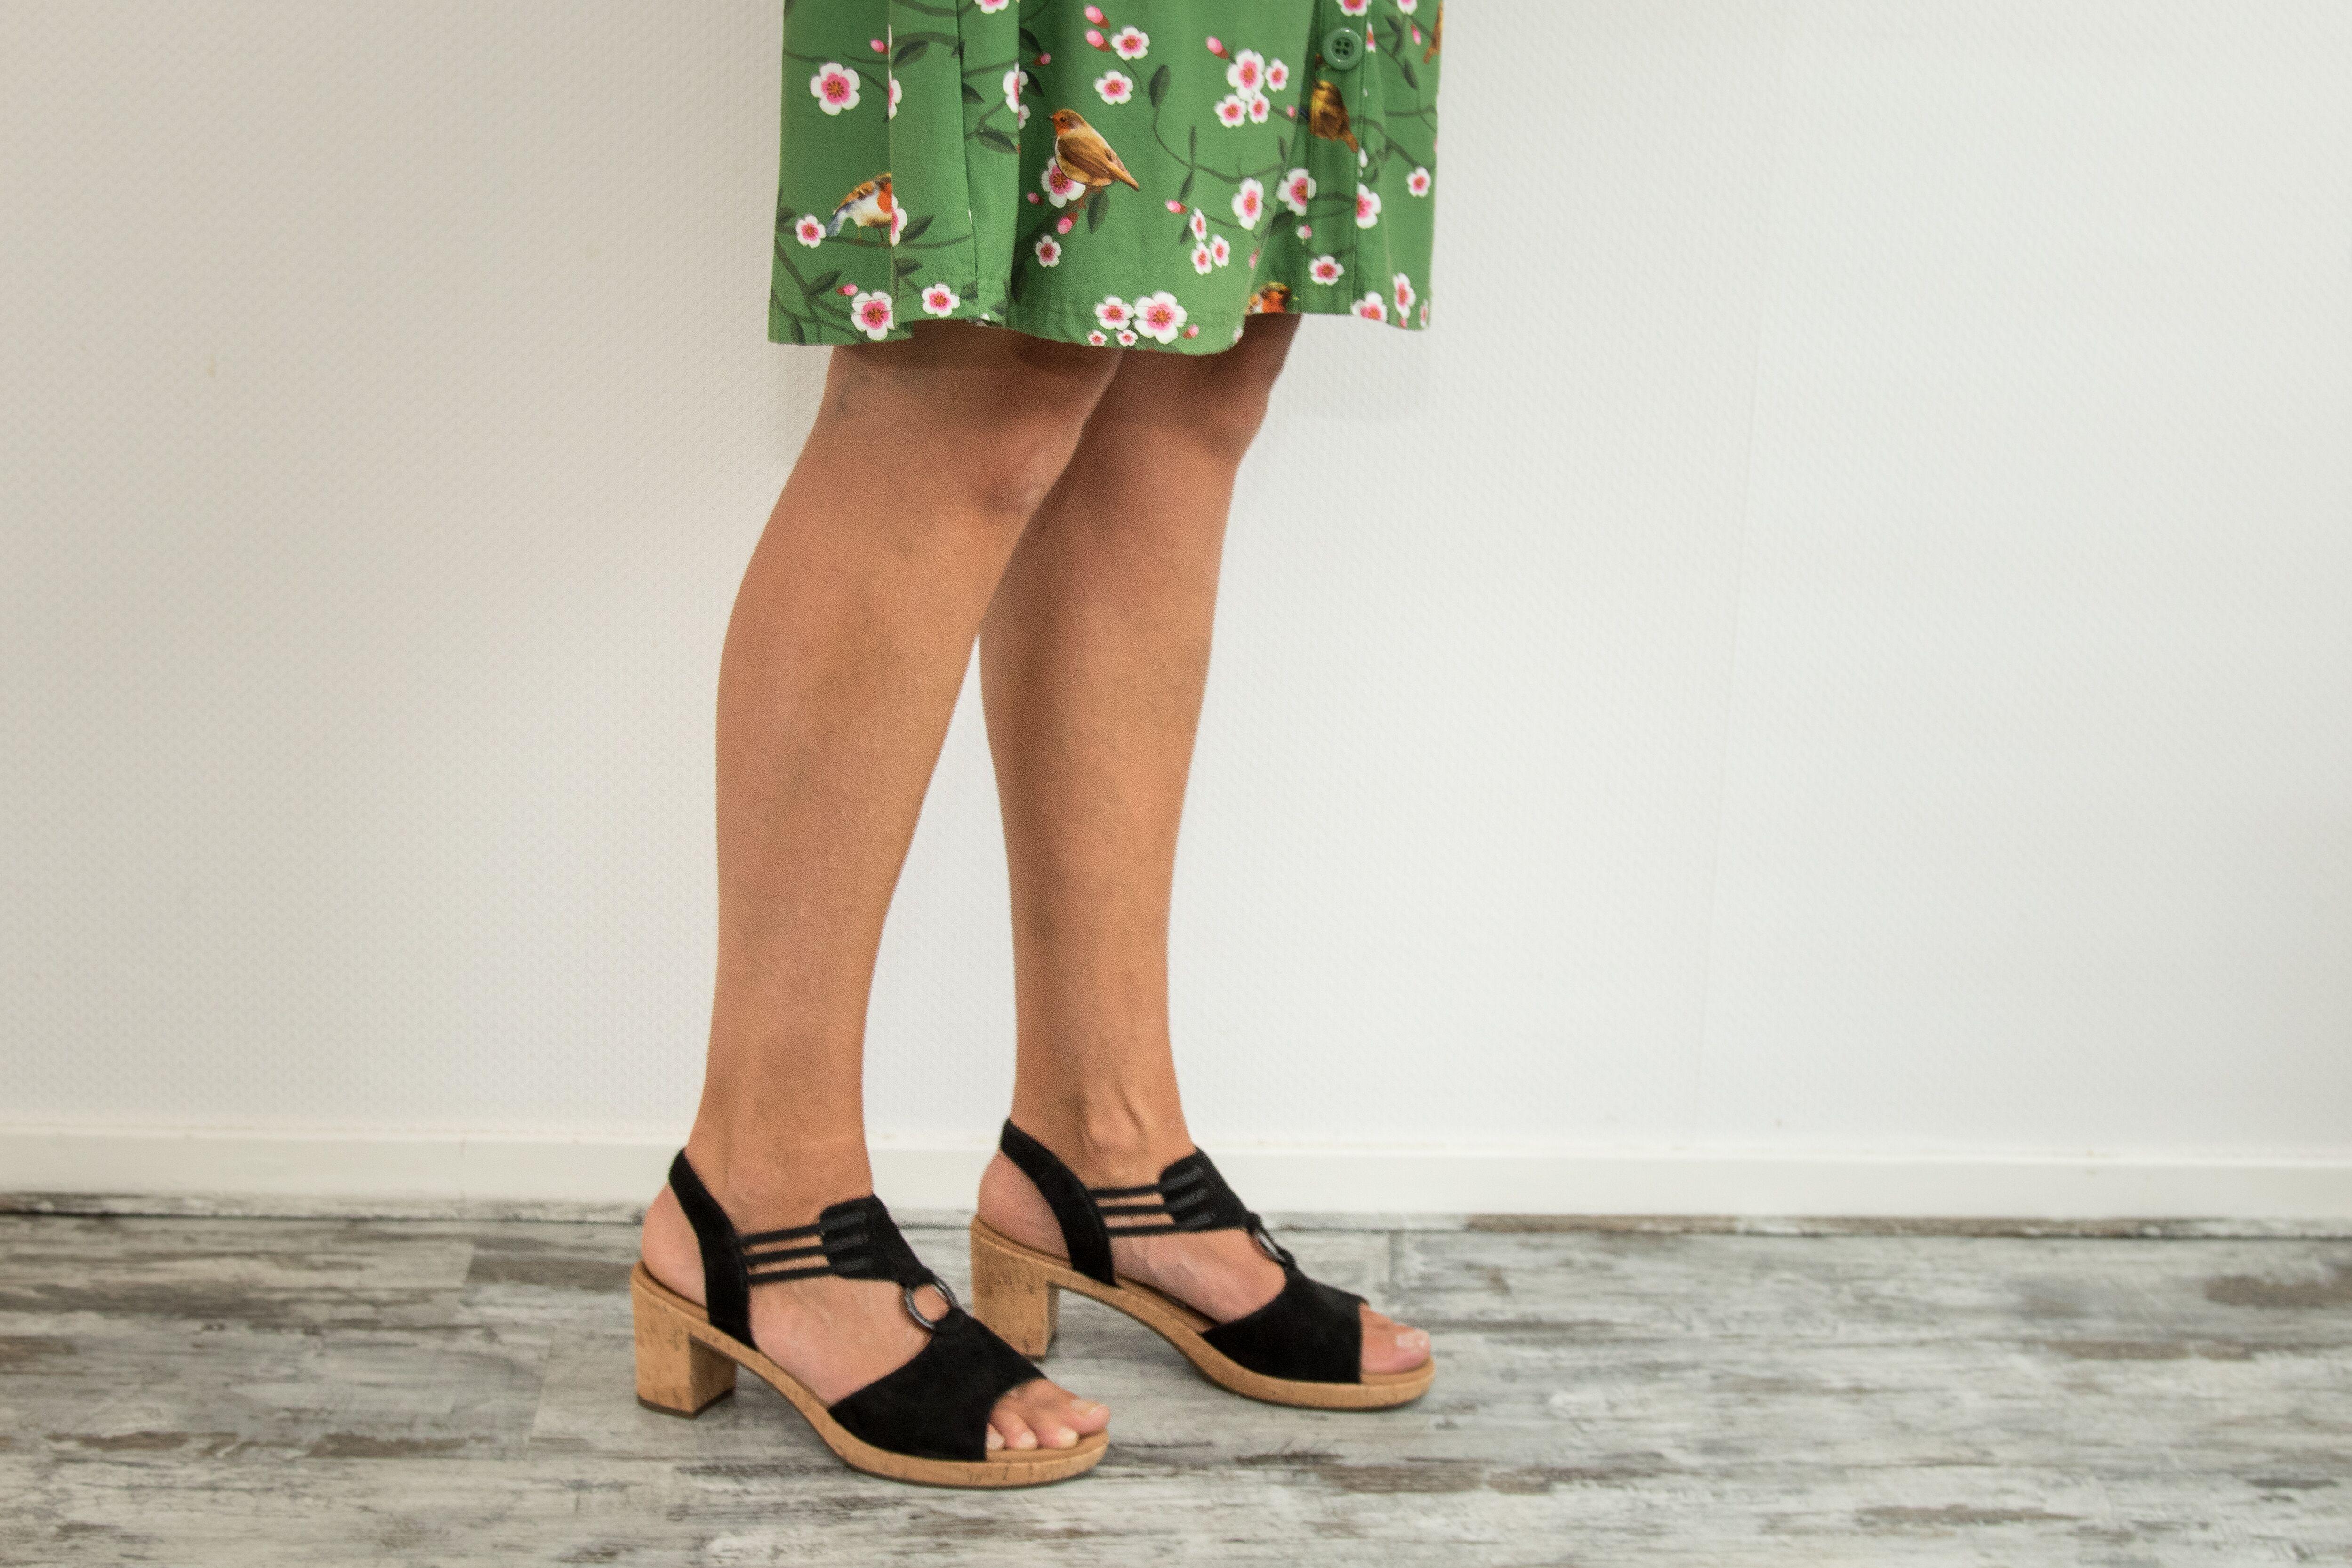 paulien vervoorn bruine benen jurkje kleding